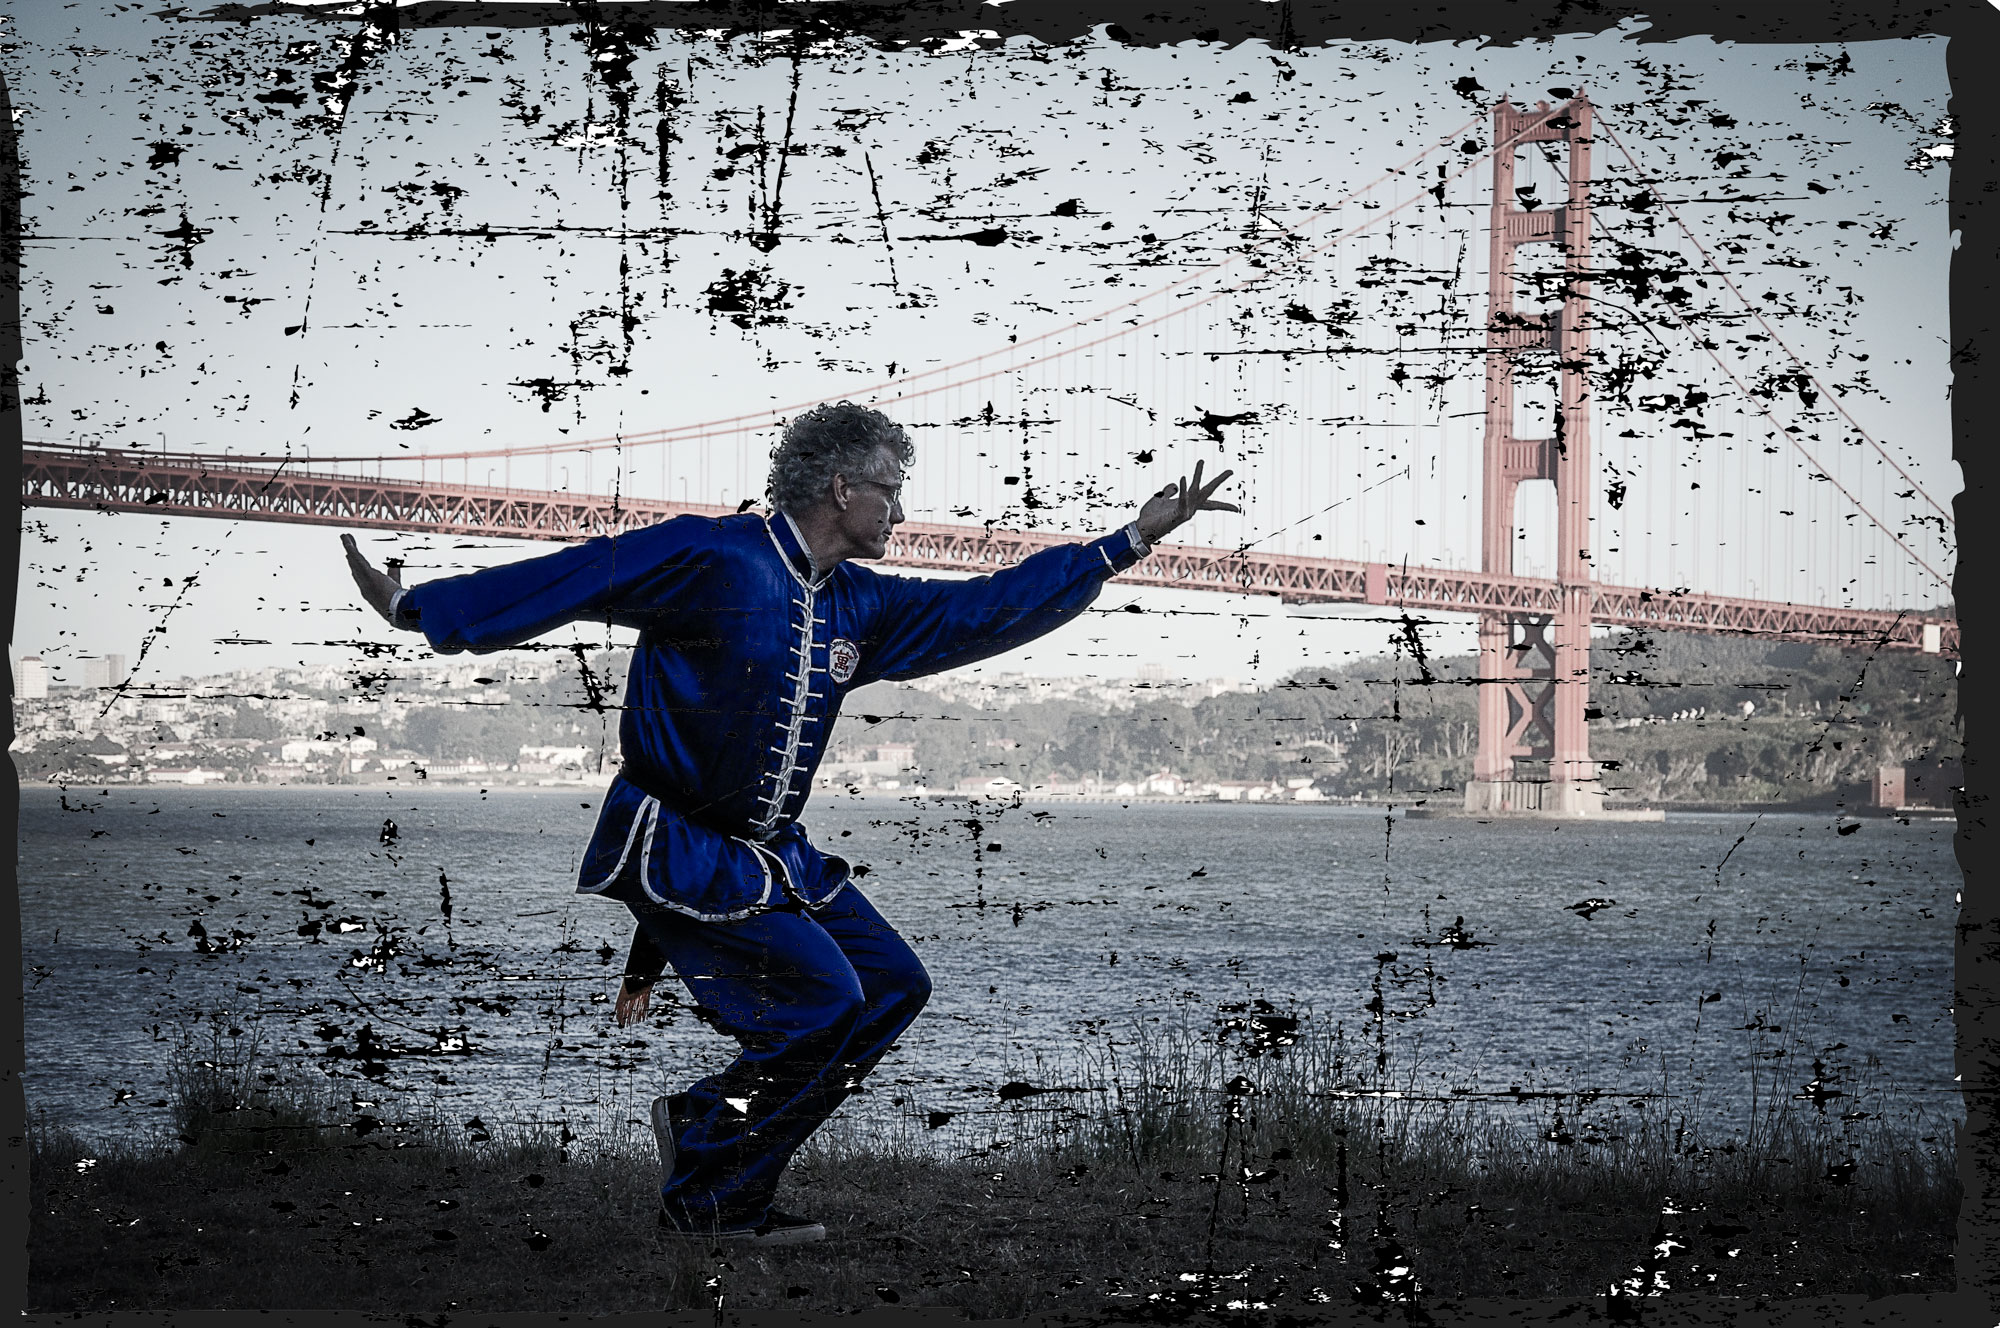 Sifu Jensen Performs Xing Yi Linking form. Sifu Jensen teaches at 10,000 Victories school in San Rafael, Marin CA.